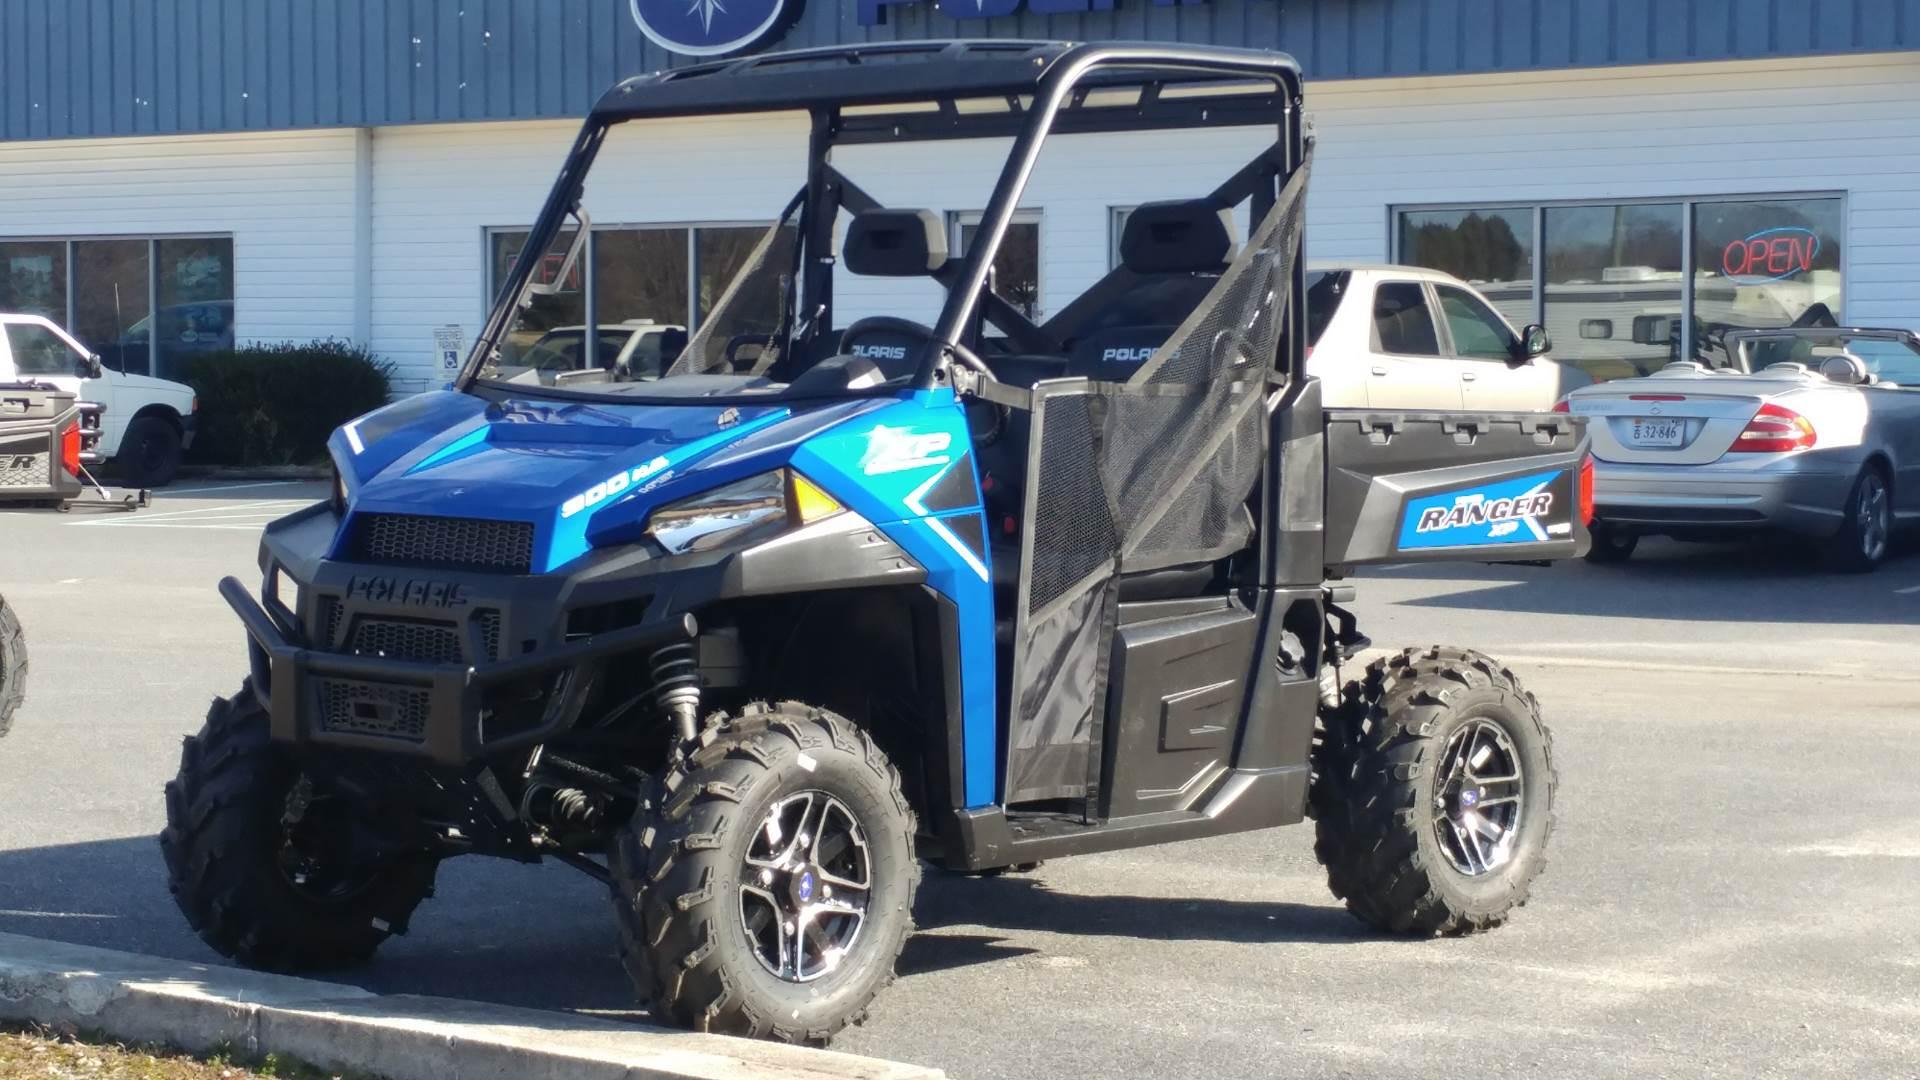 New 2018 Polaris Ranger XP 900 EPS Utility Vehicles in ...